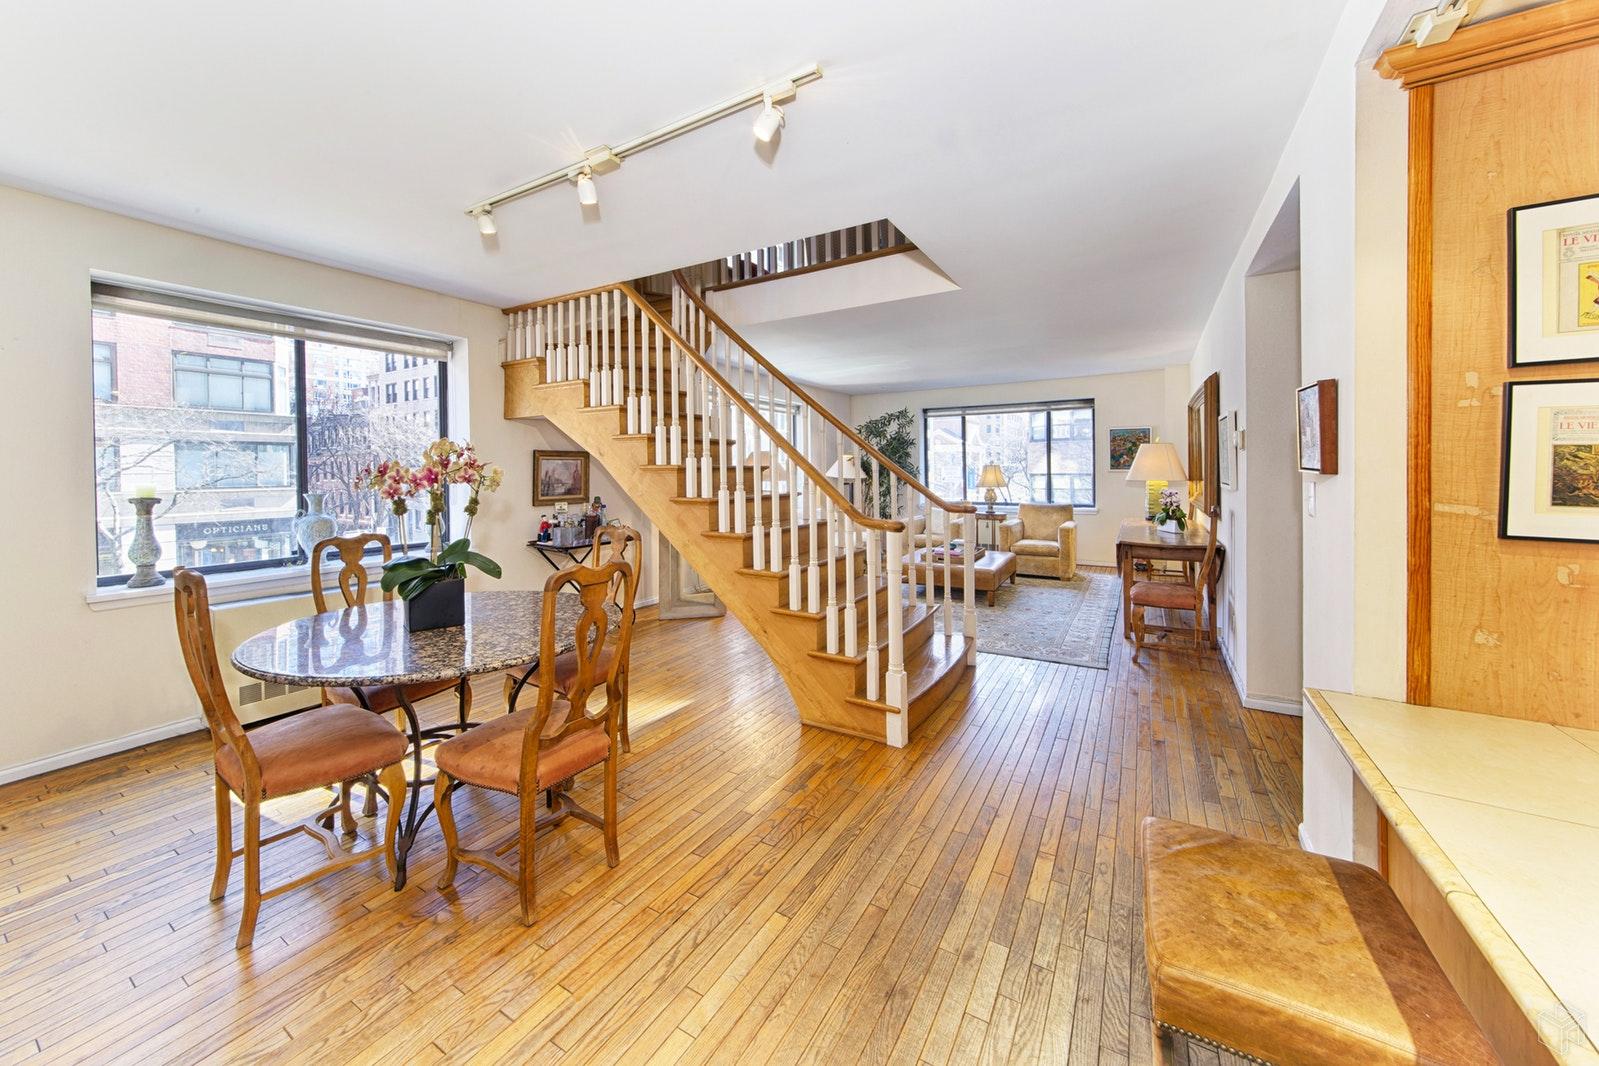 131 EAST 81ST STREET 2A/3A, Upper East Side, $3,150,000, Web #: 19477675